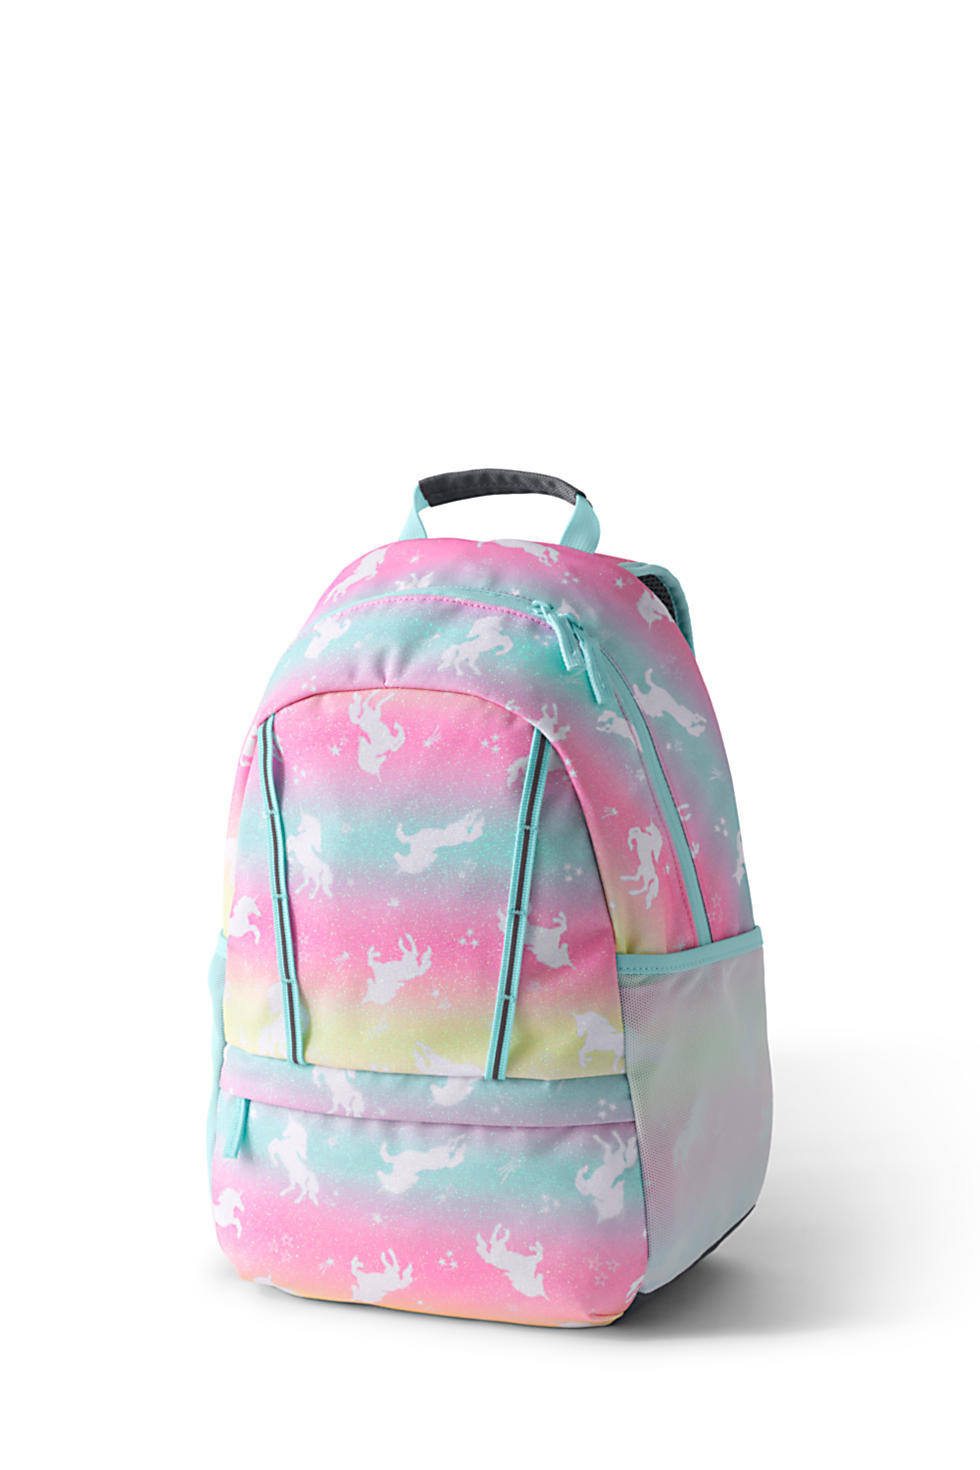 Lands End Kids ClassMate Small Backpack